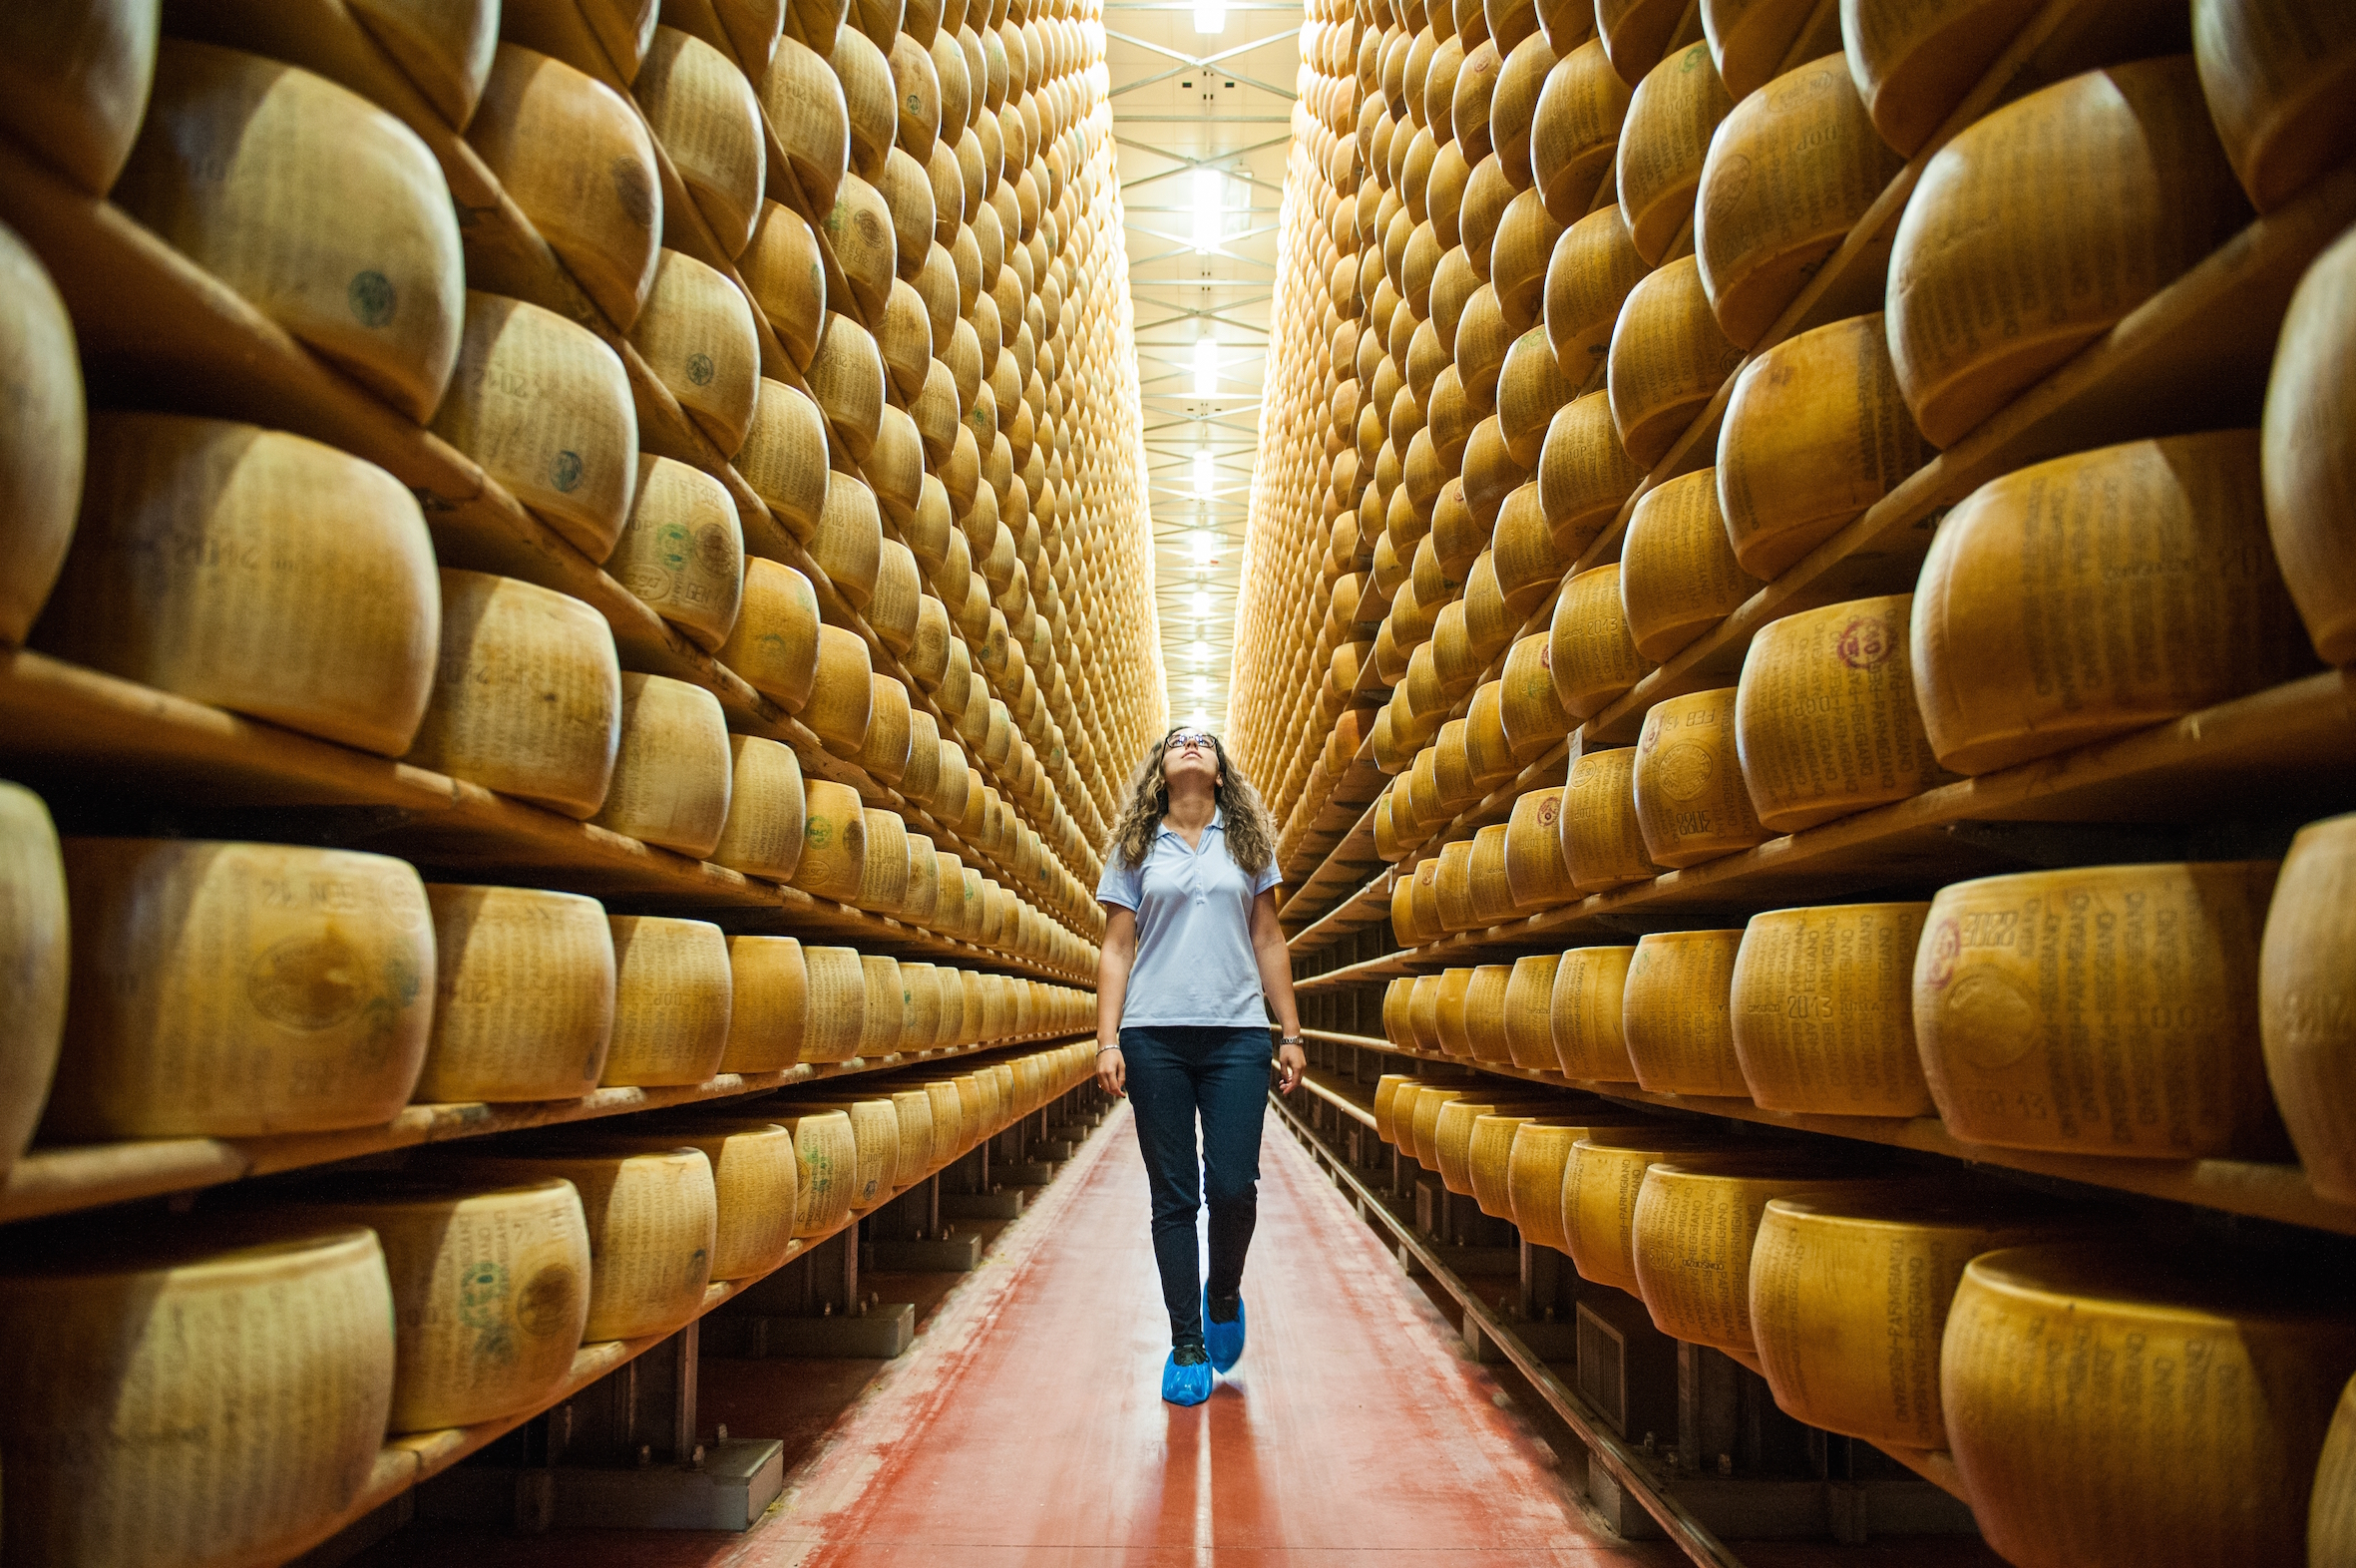 BlogVille 2018 – A journey called Emilia-Romagna